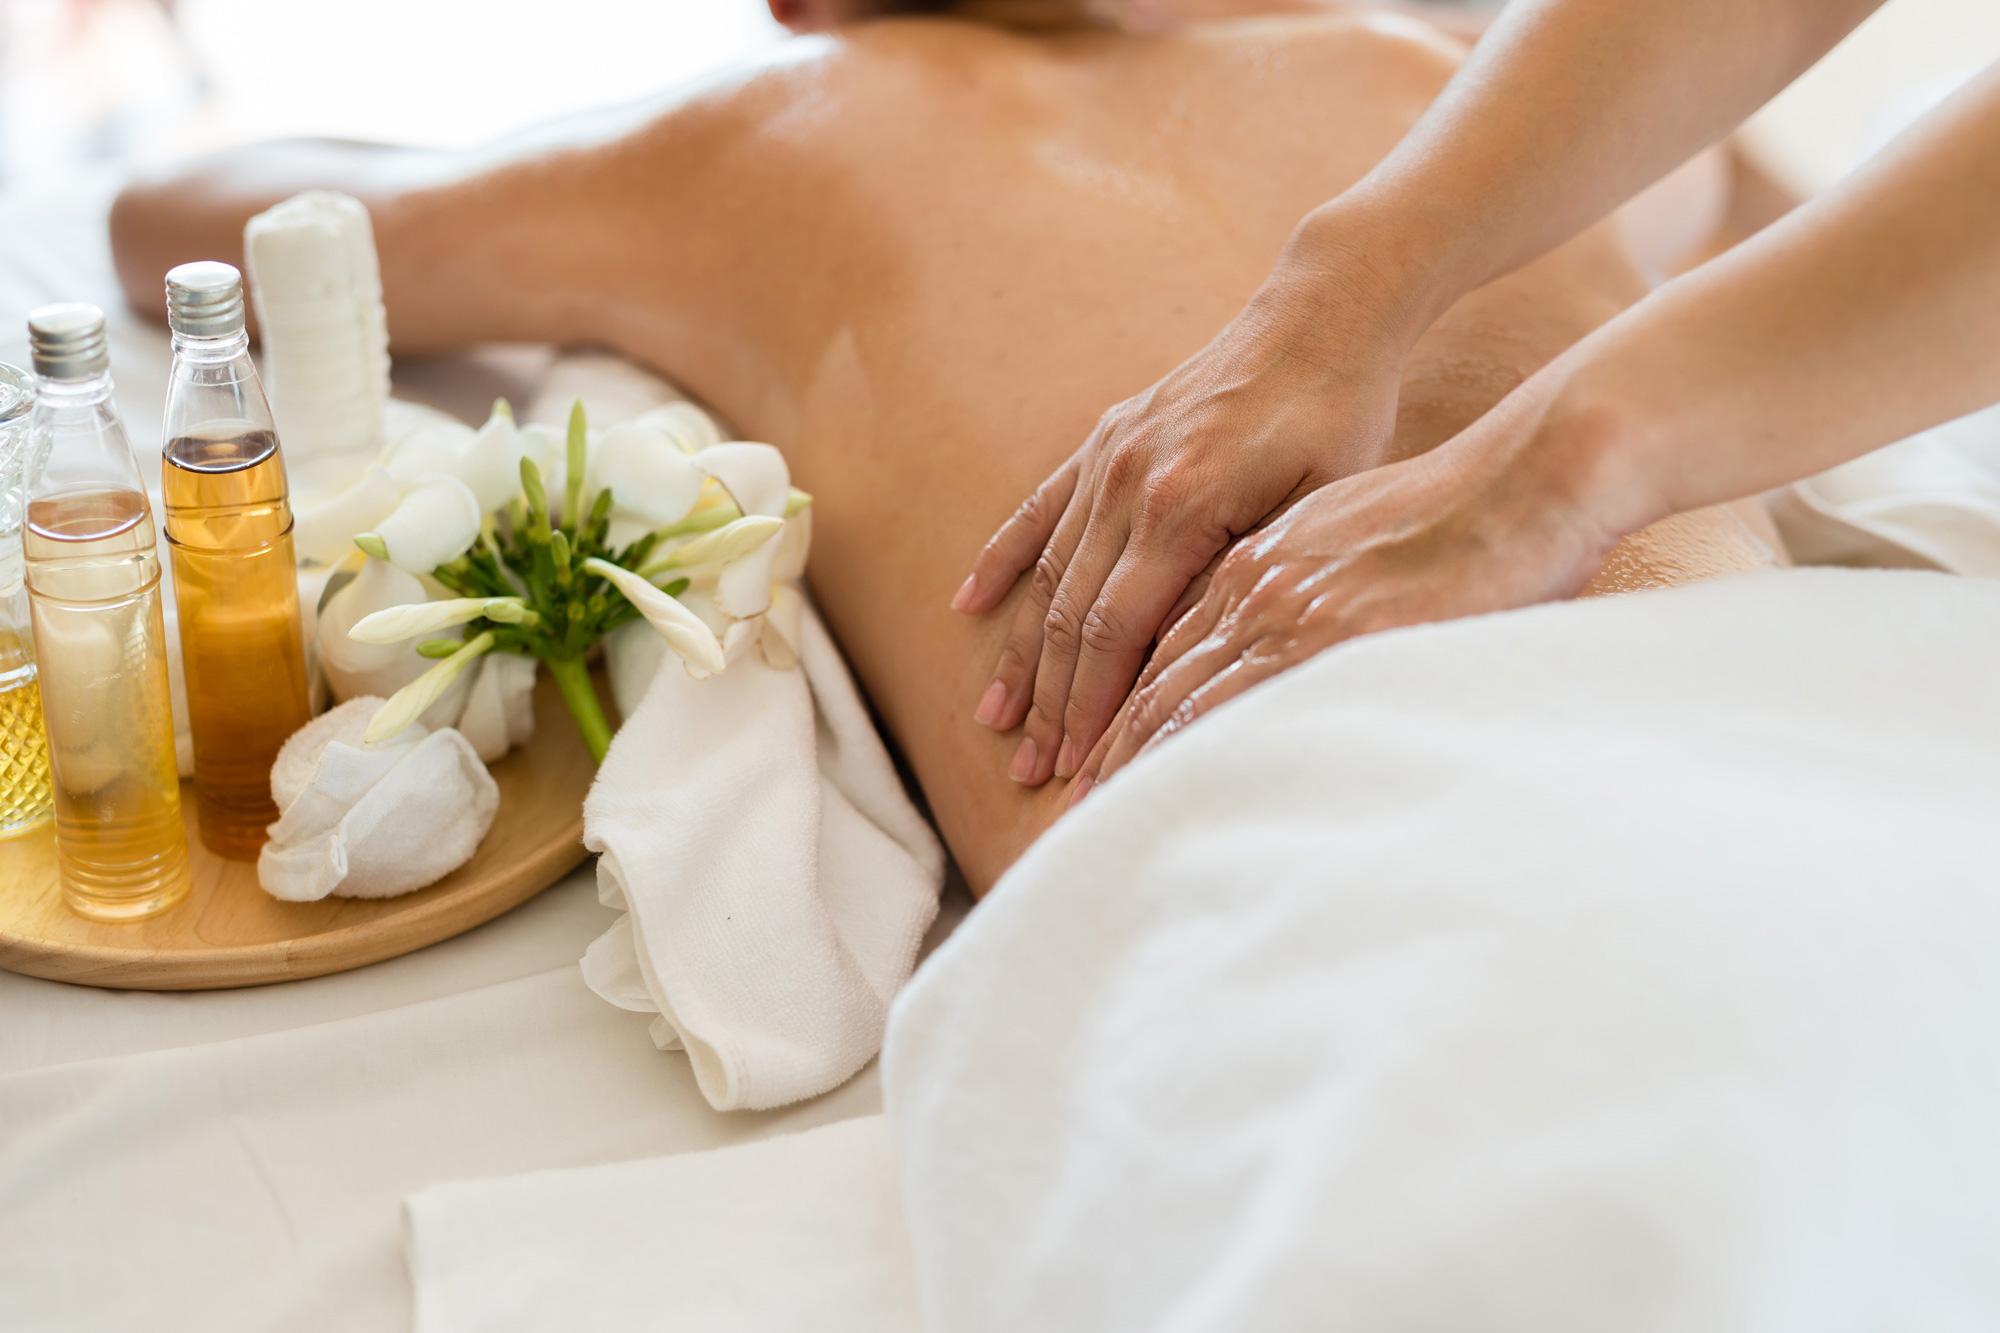 korawan-thaimassage-konstanz-frau-thai-aroma-oel-massage-2000x1333